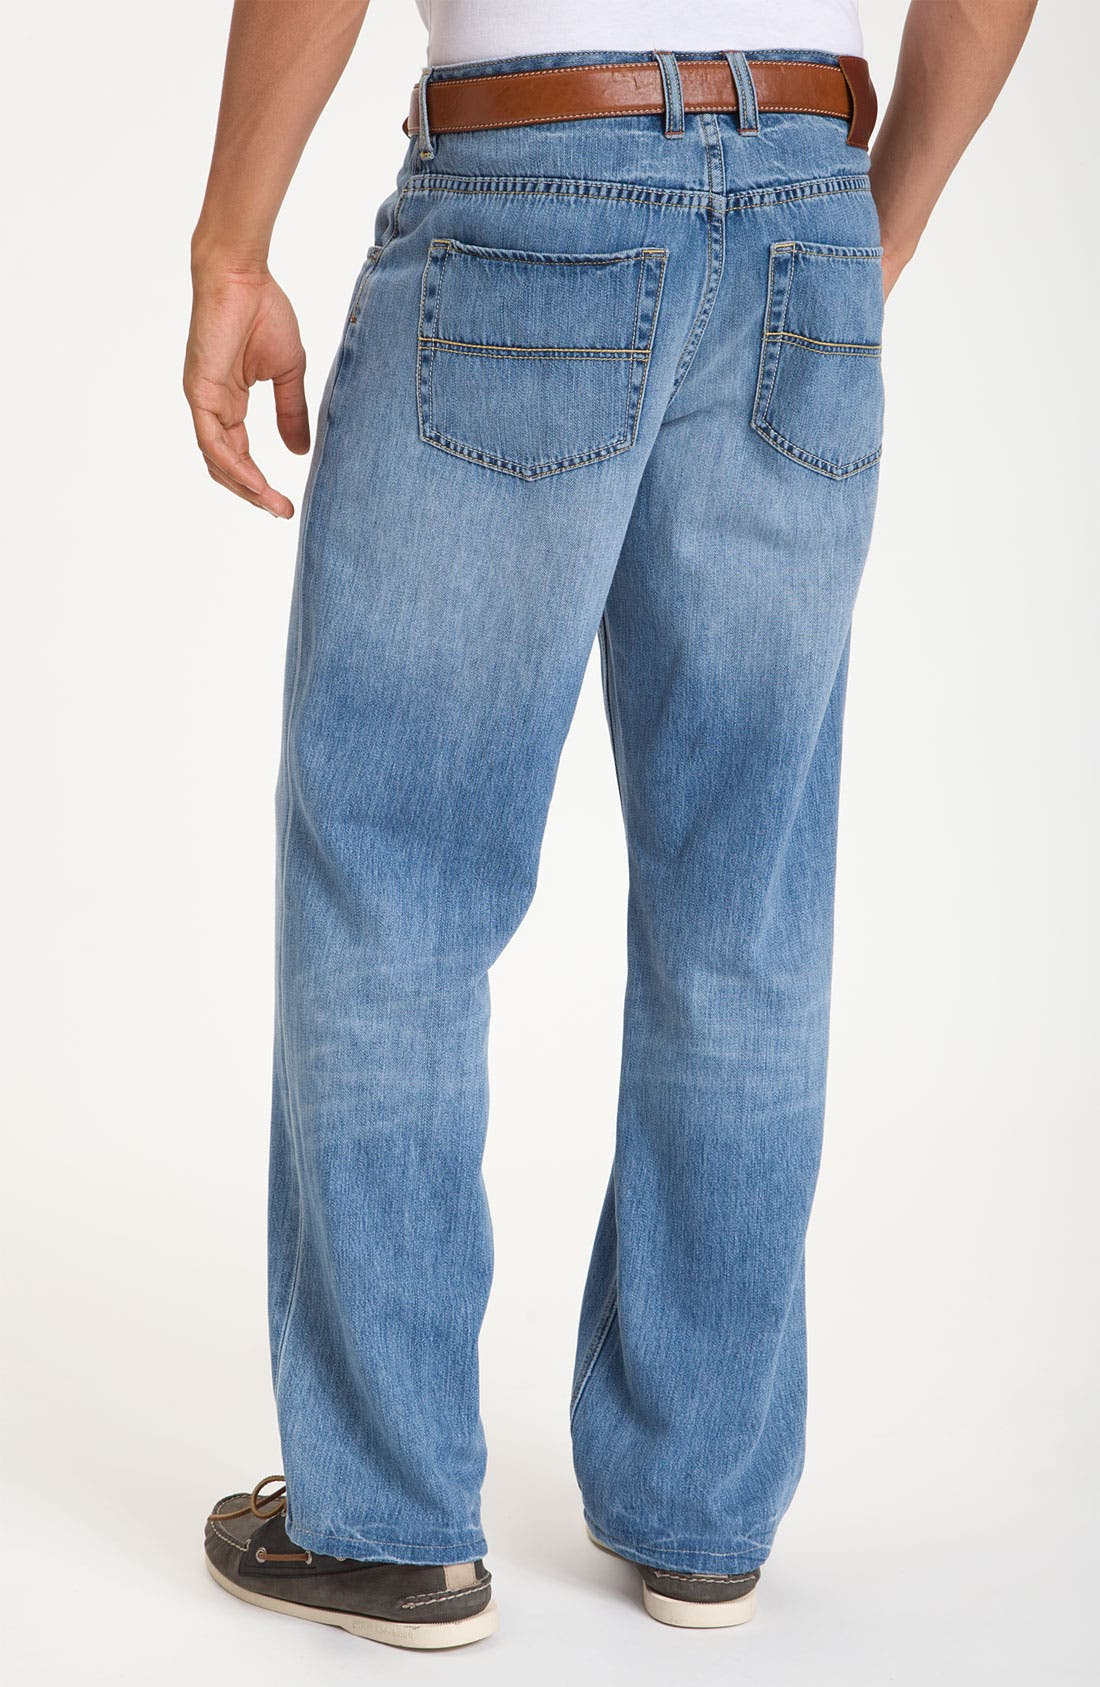 Alternate Image 2  - Tommy Bahama Denim 'Island Ease' Classic Fit Jeans (Vintage Light)